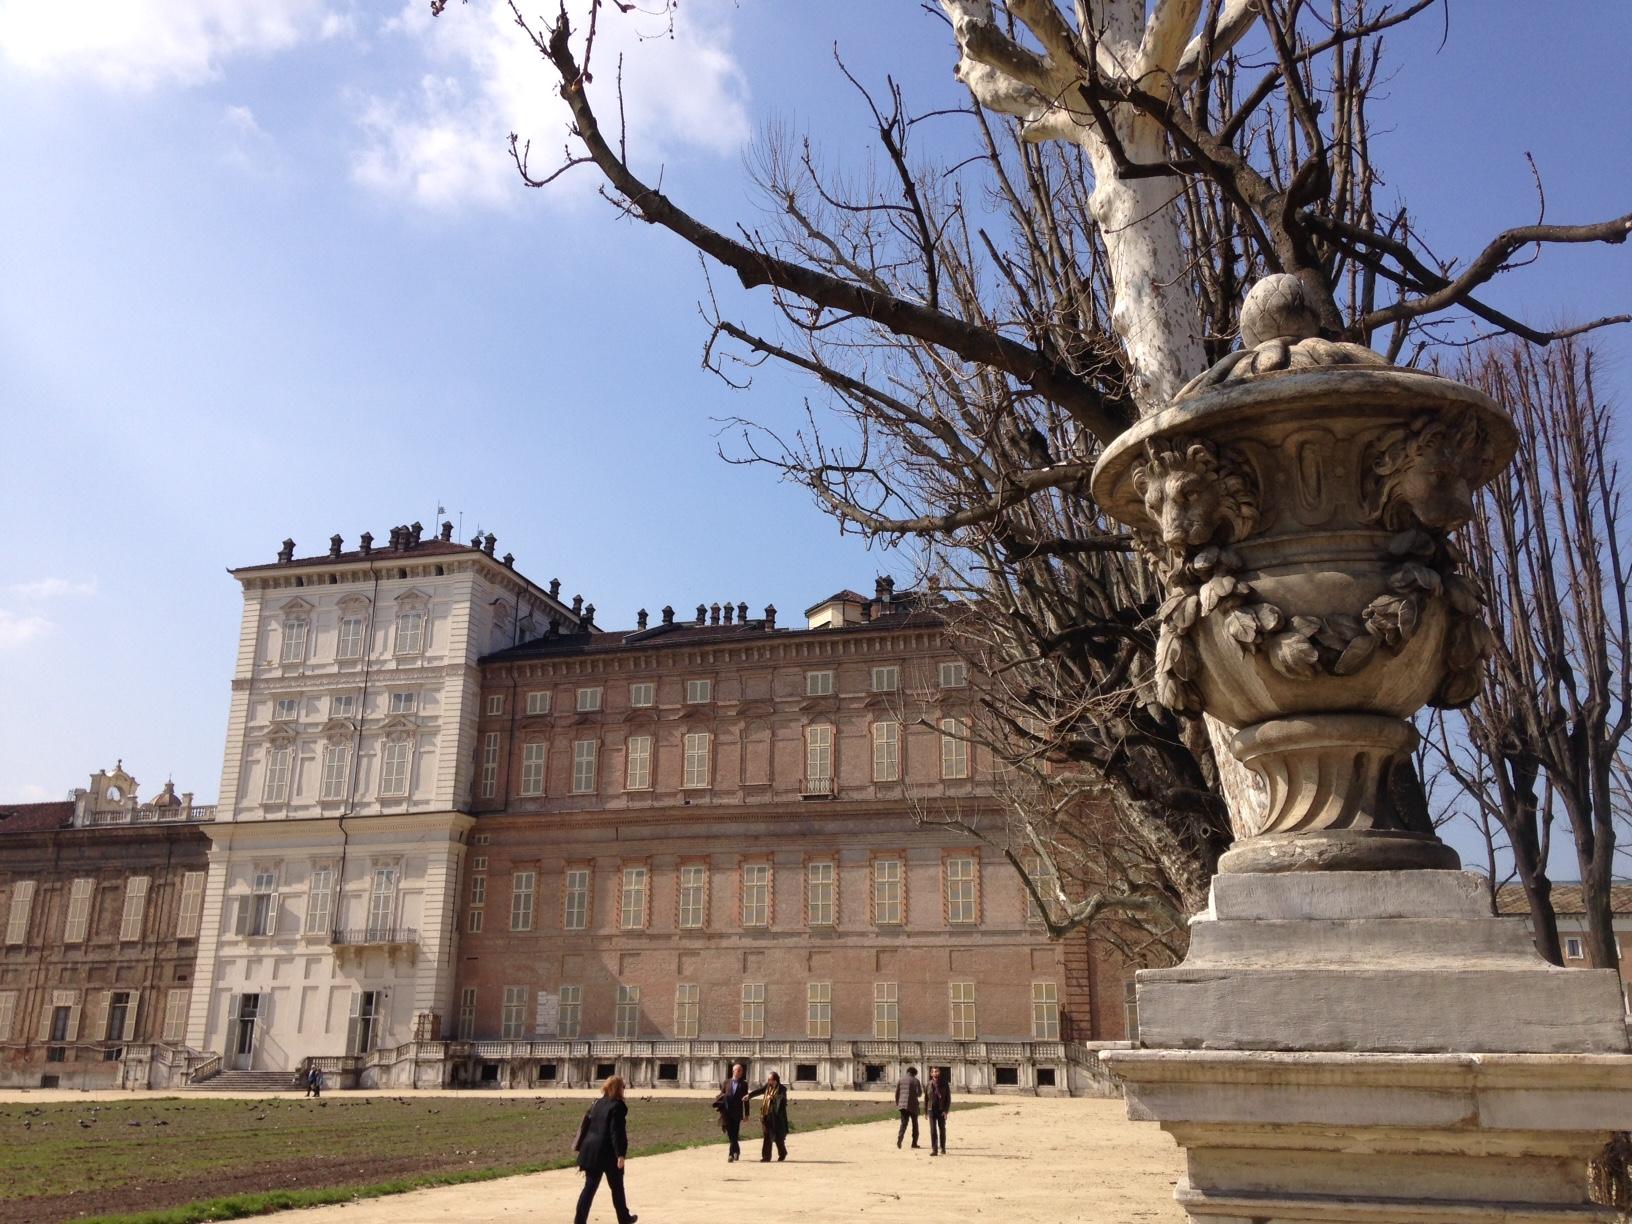 Art bonus musei reali torino giardini reali